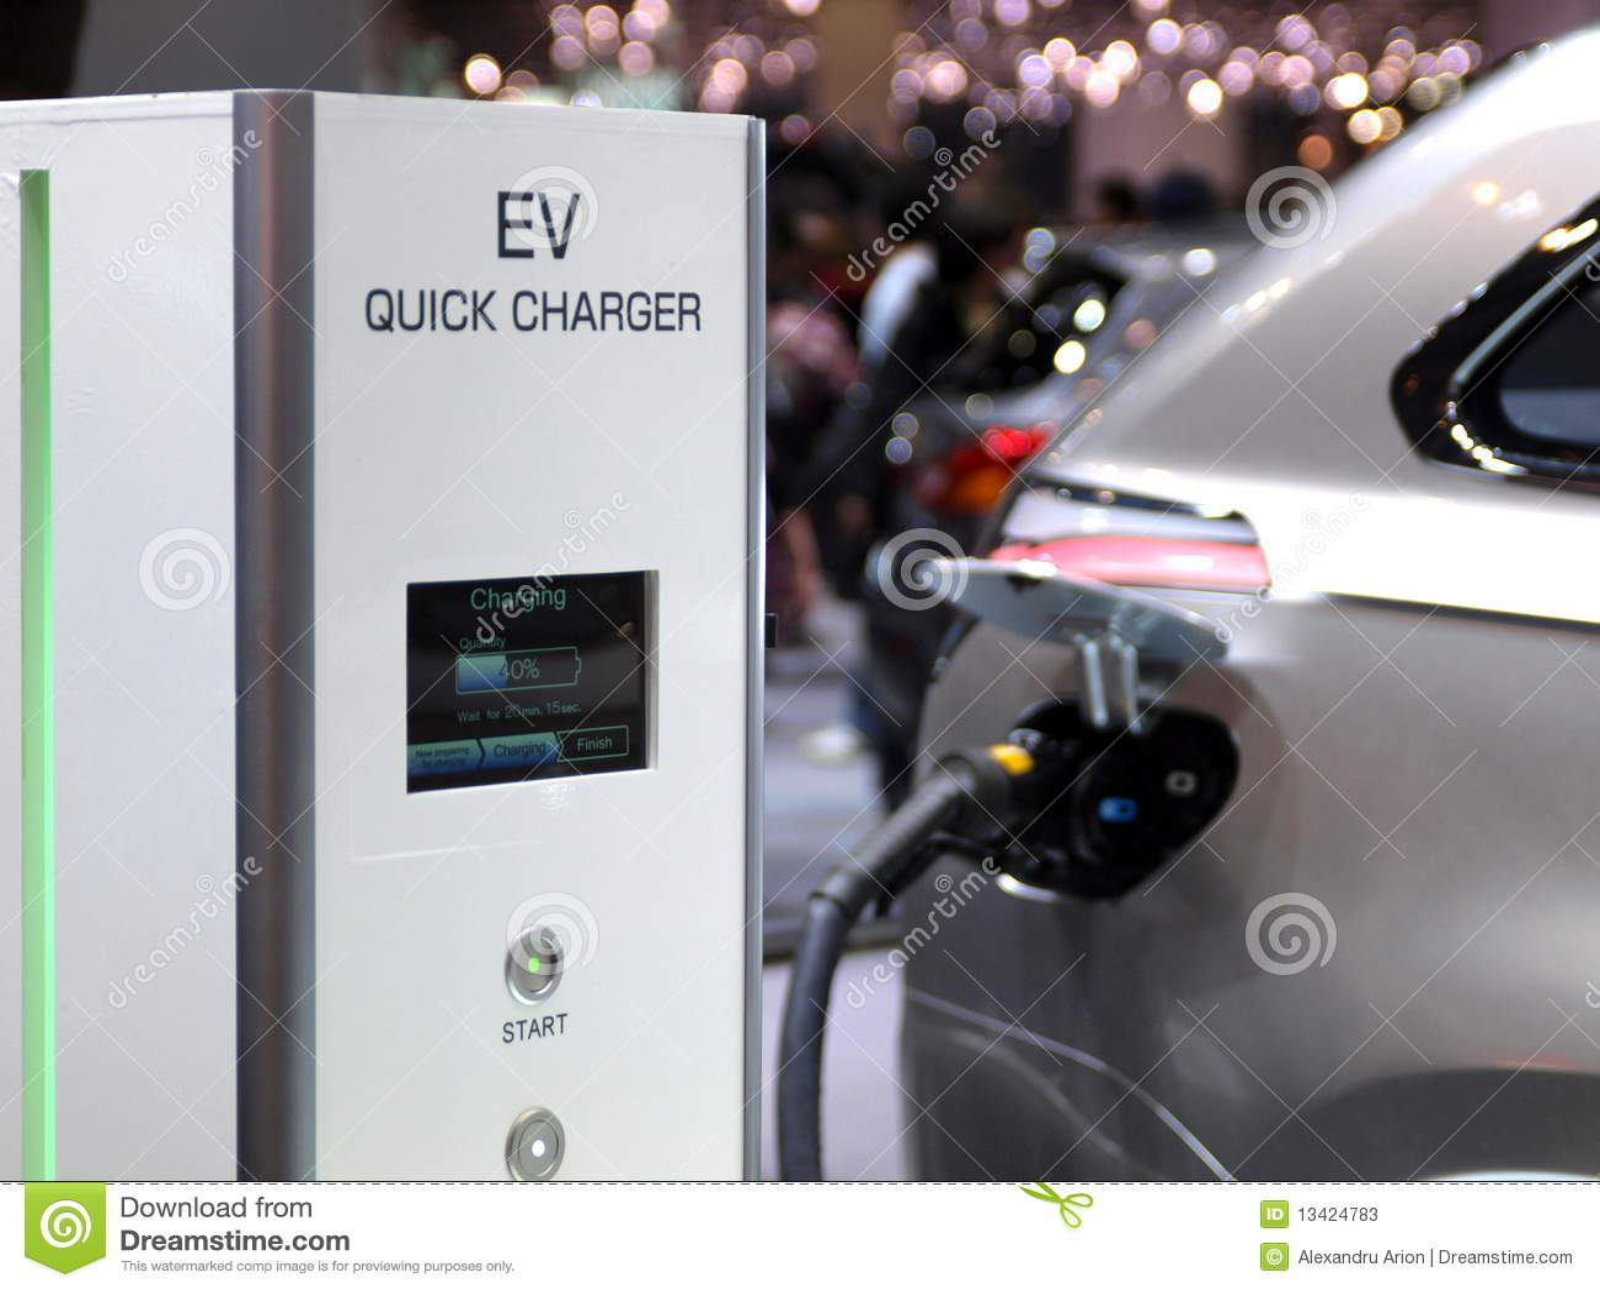 Futuristic electric concept car charging